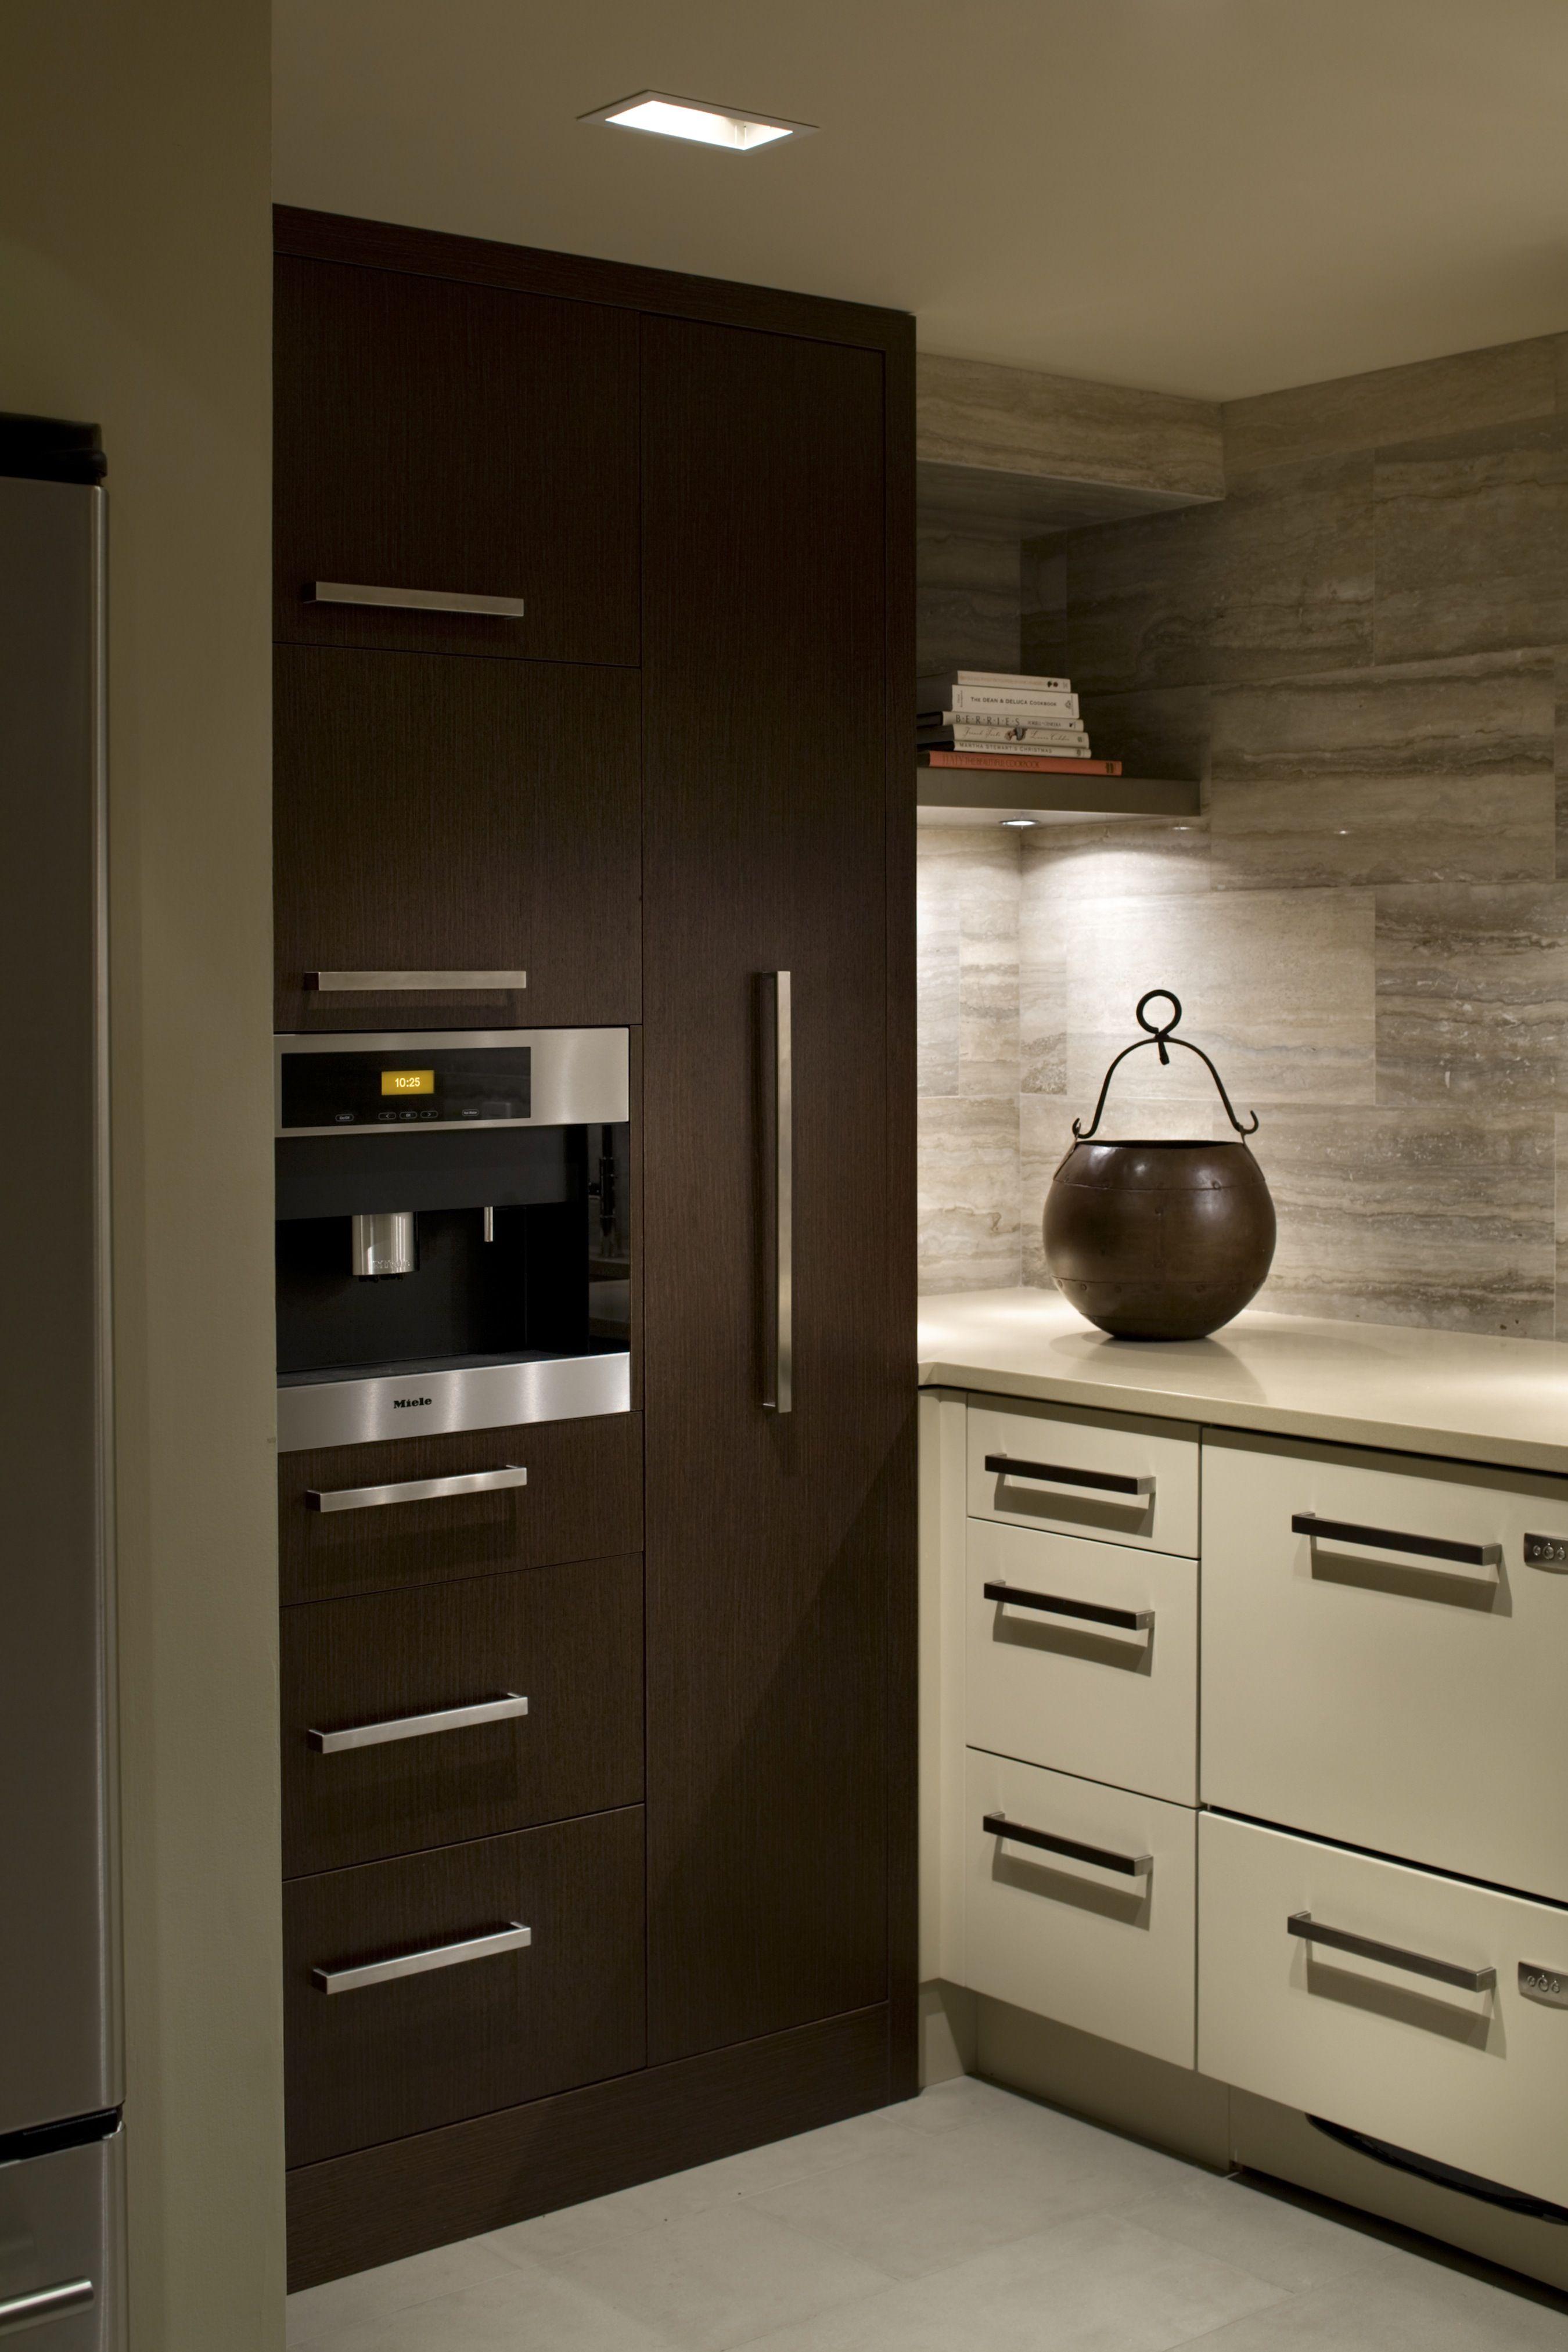 patricia gray interior design kitchen pantry very asian inspired rh pinterest com